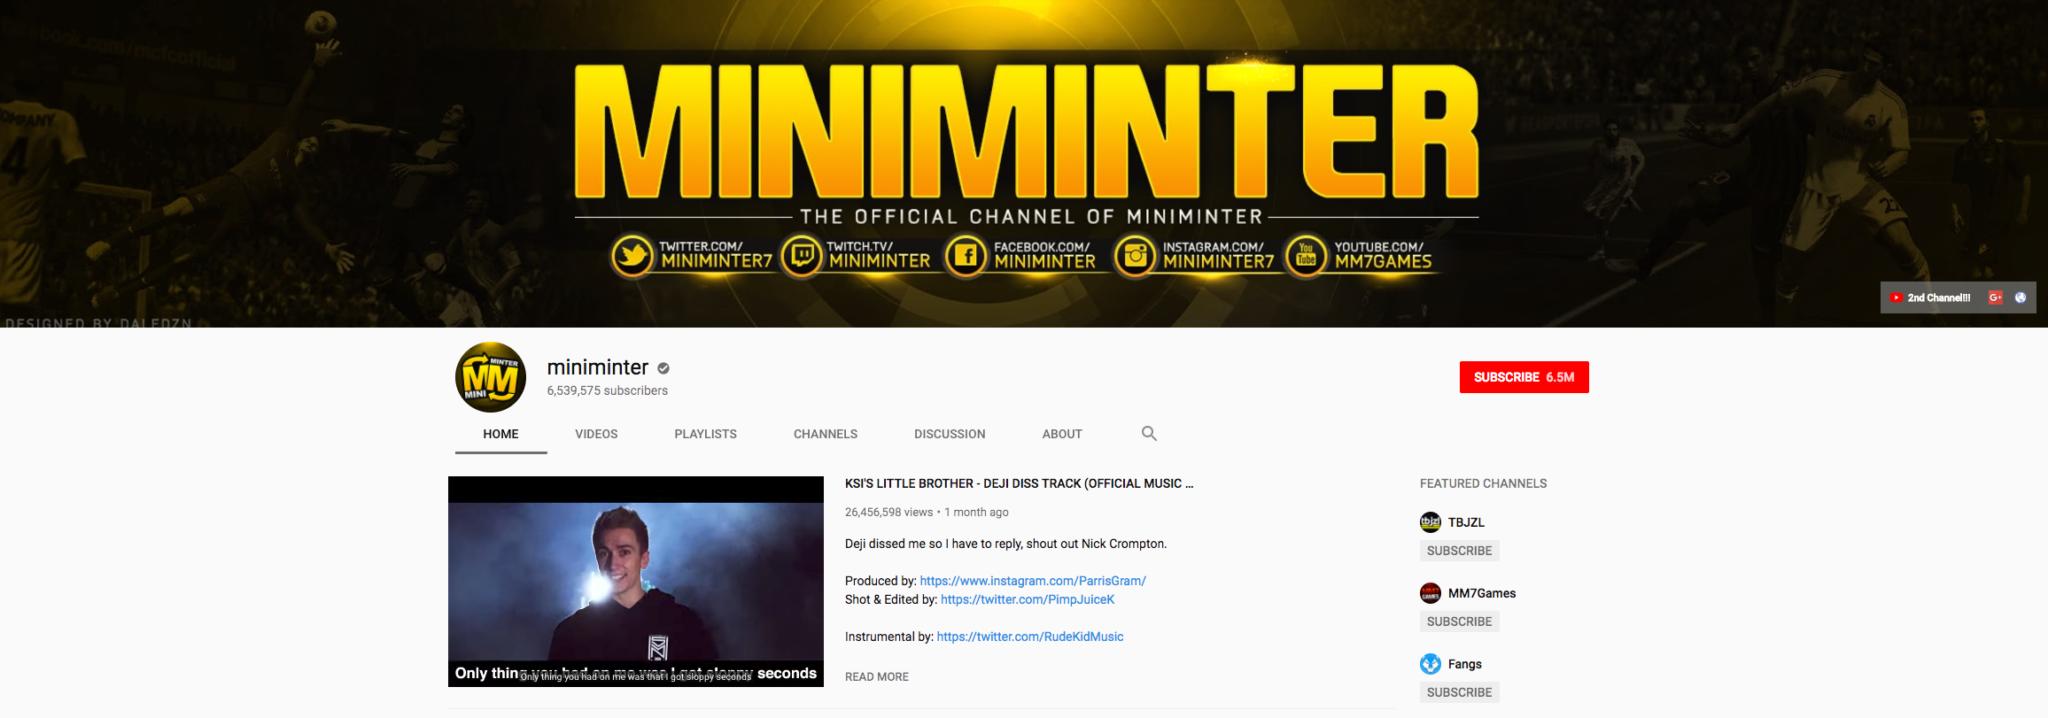 miniminter top gaming influencers